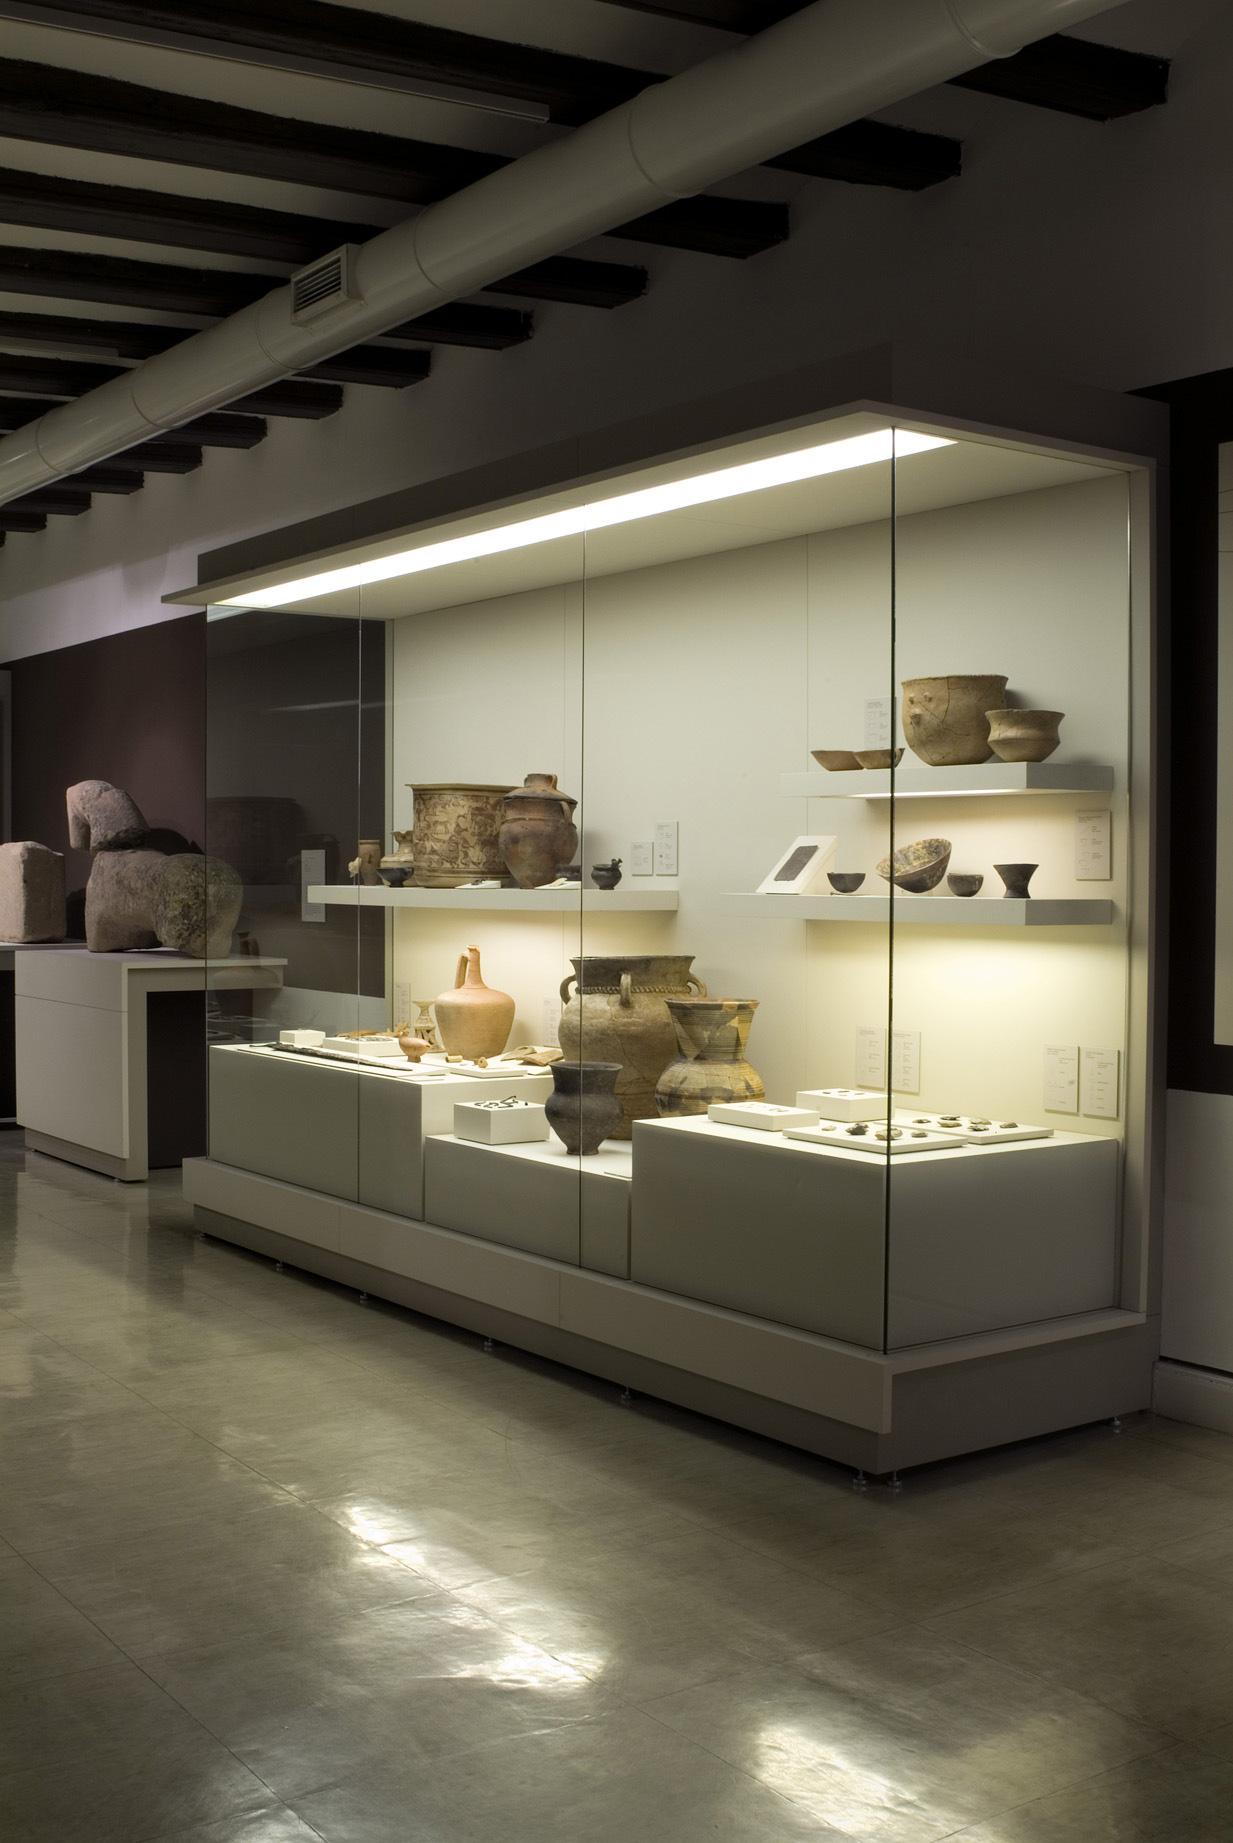 Cien_anos_de_arqueologia_en_teruel_6.jpg